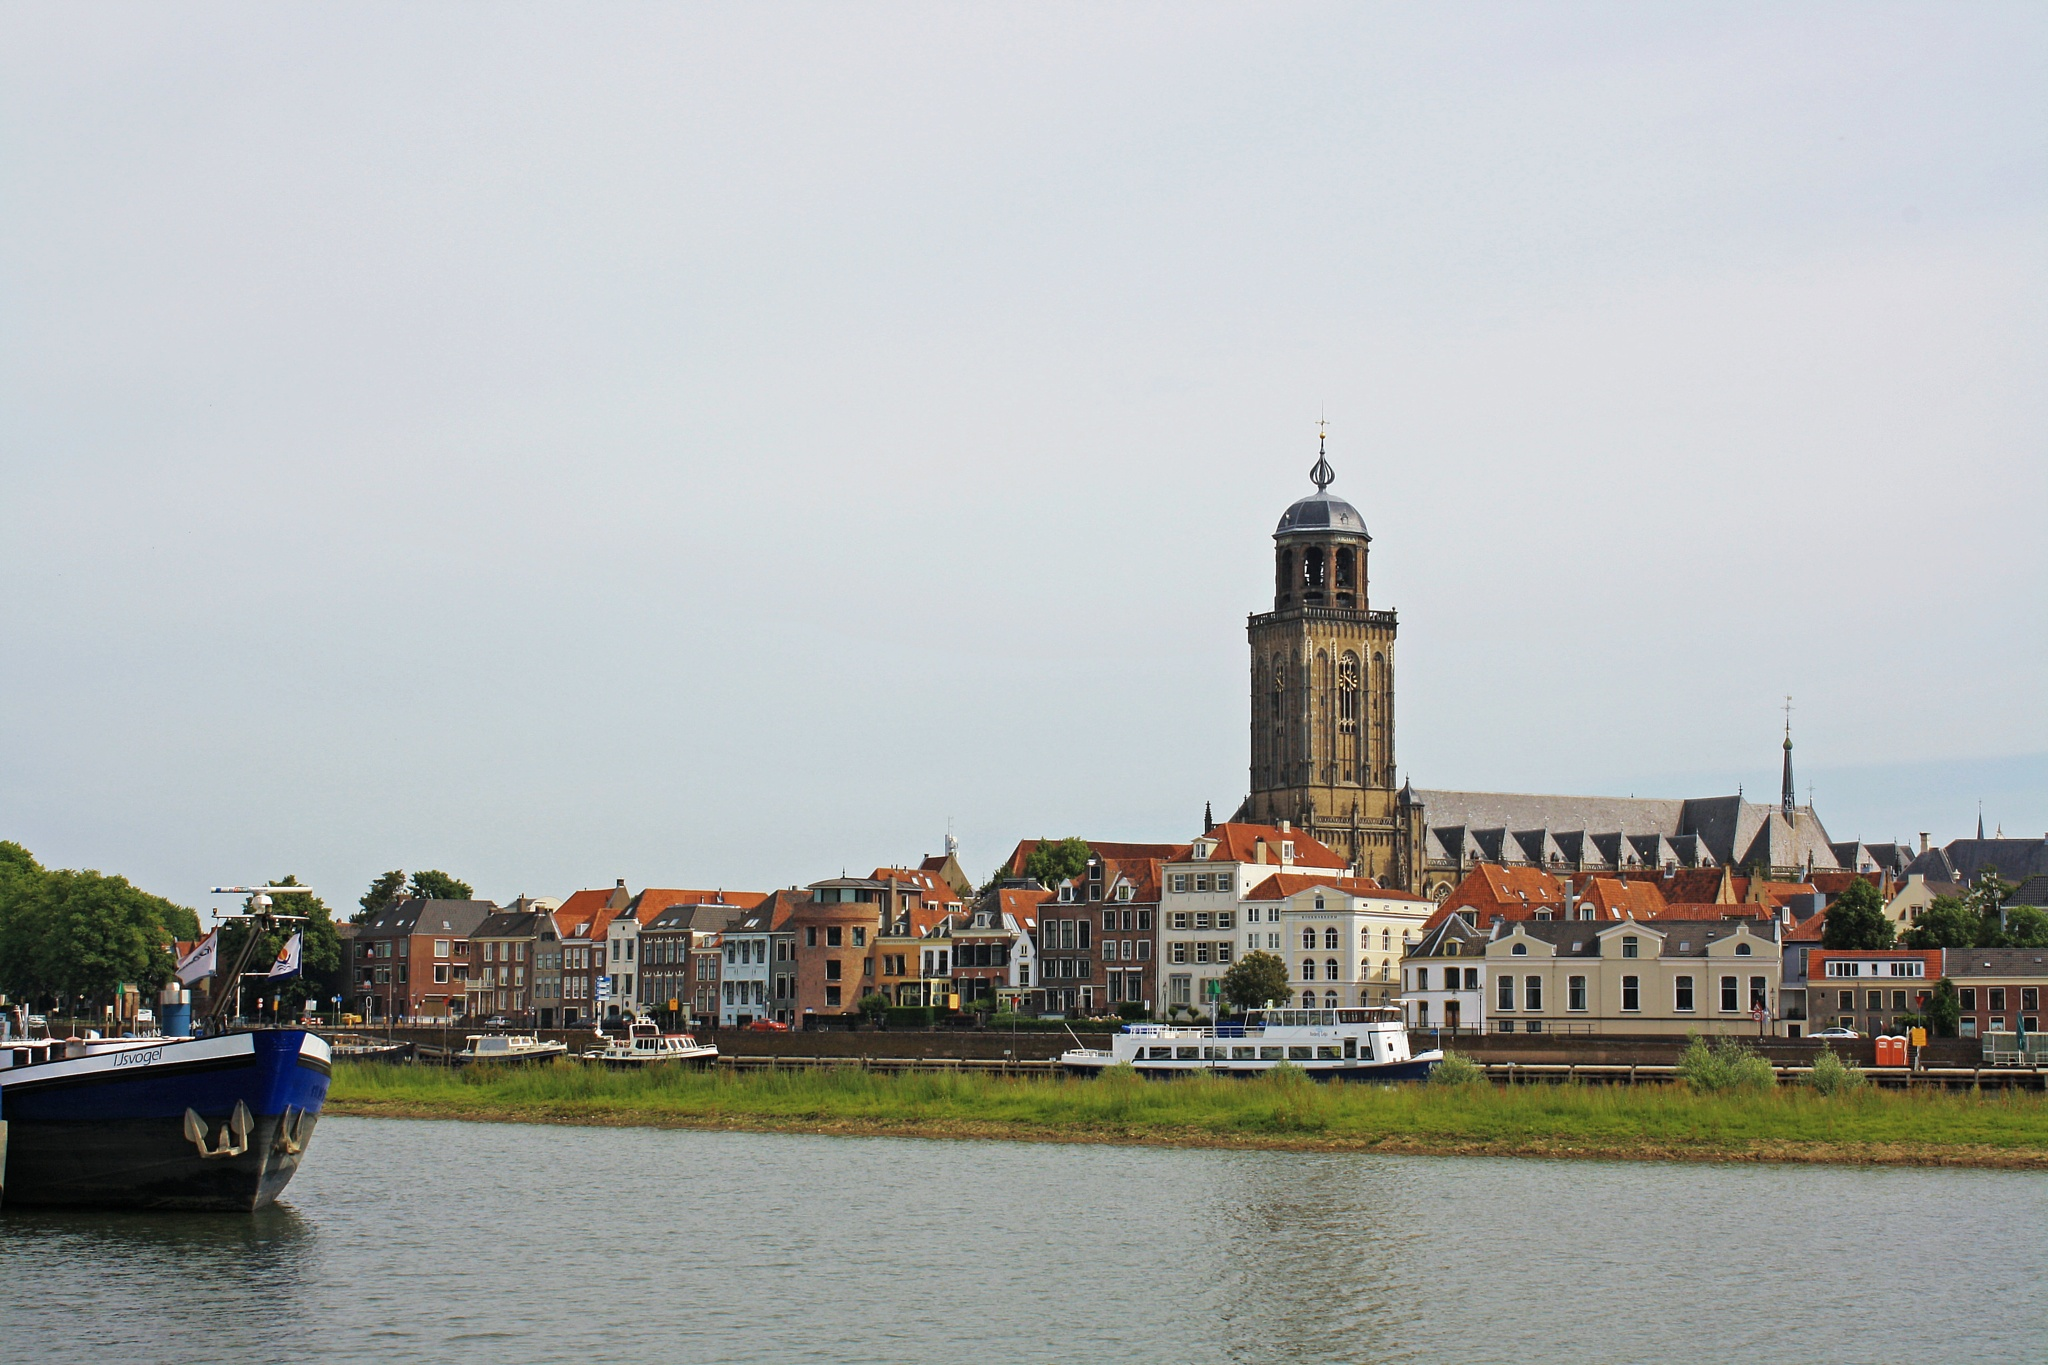 Skyline of Deventer-Holland by Bob66